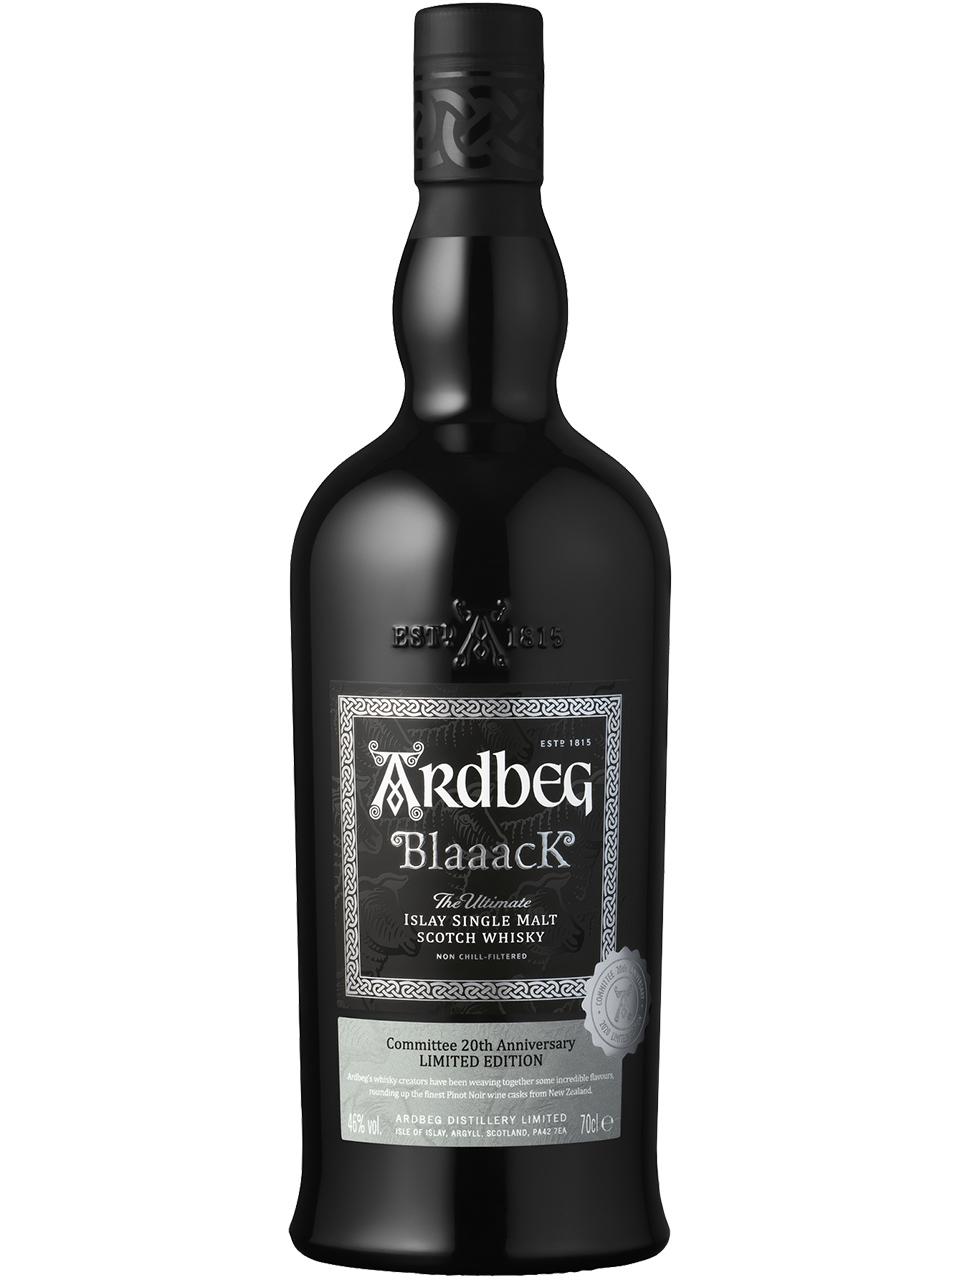 Ardbeg Blaaack Regular Release